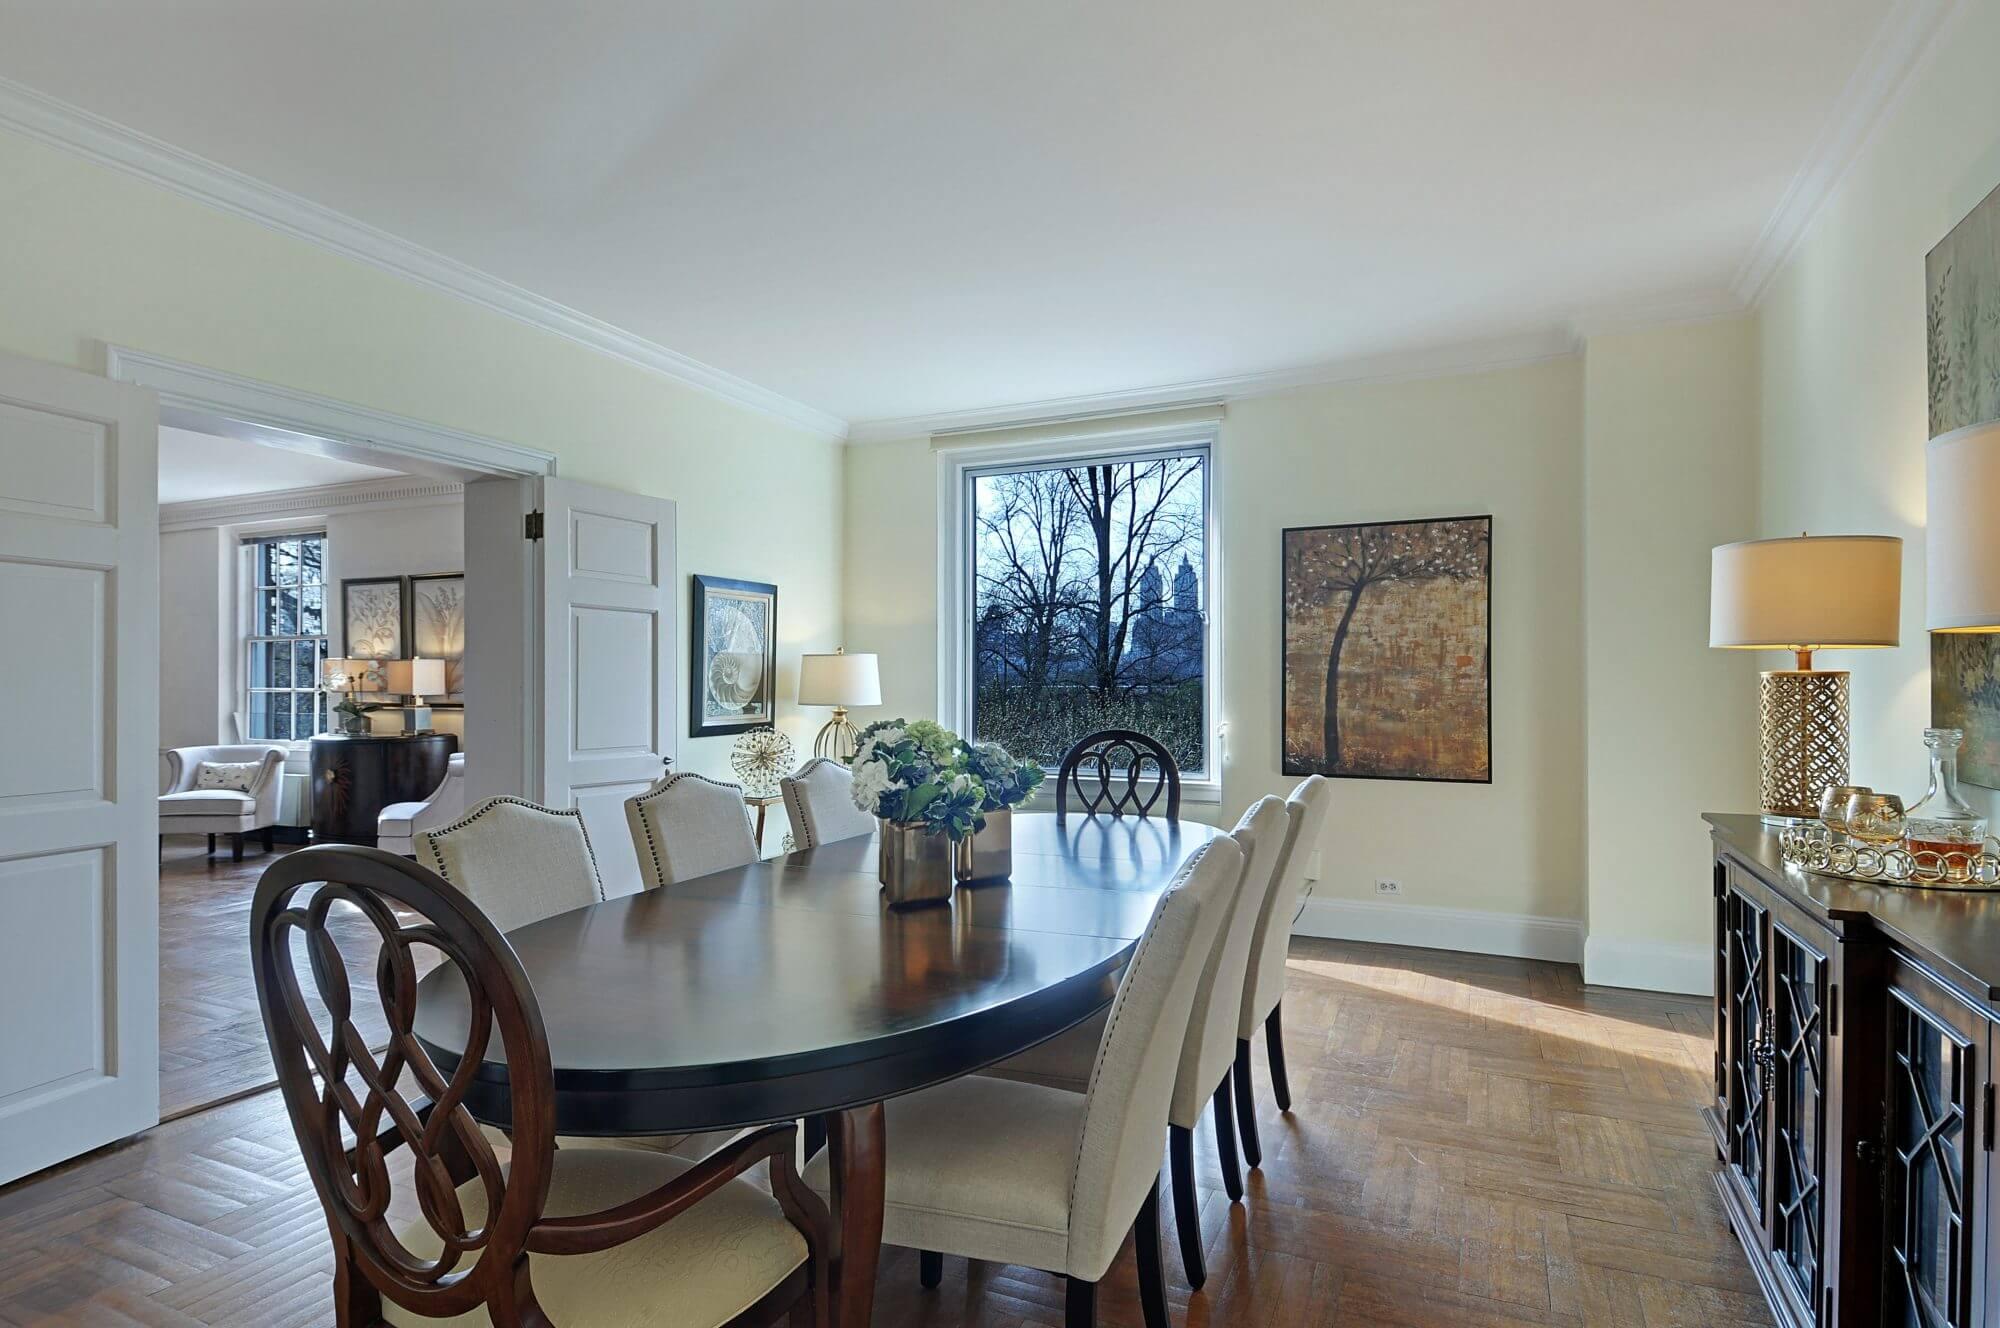 1120 Fifth Avenue Apt. 3C - Dining Room